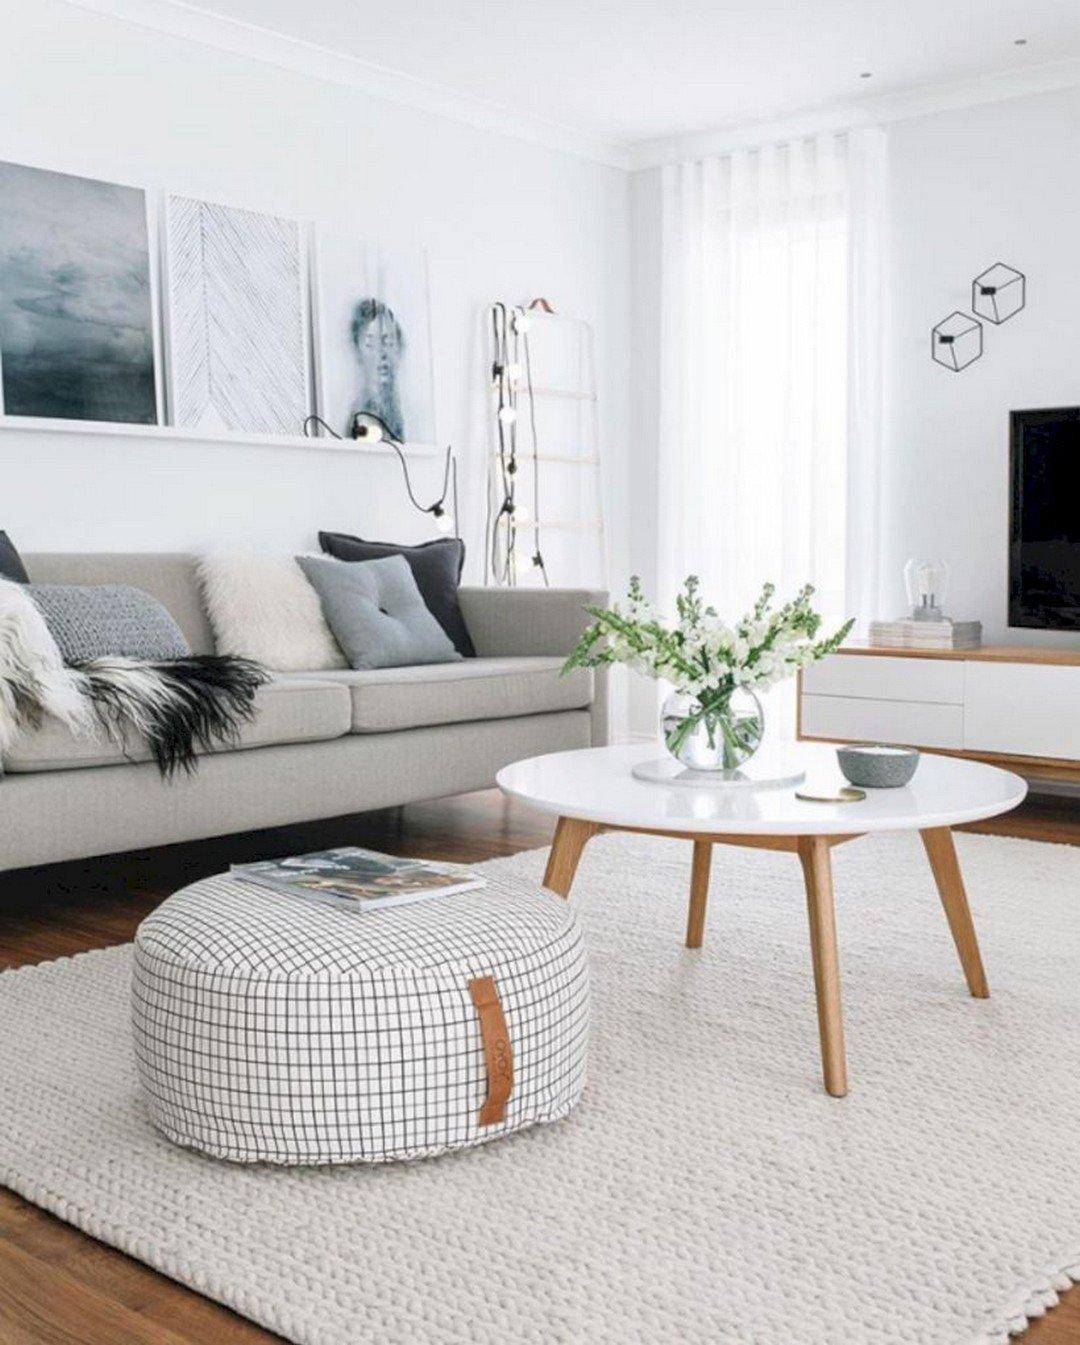 Cozy Small Living Room Ideas Luxury 15 Perfect and Cozy Small Living Room Design De Agz